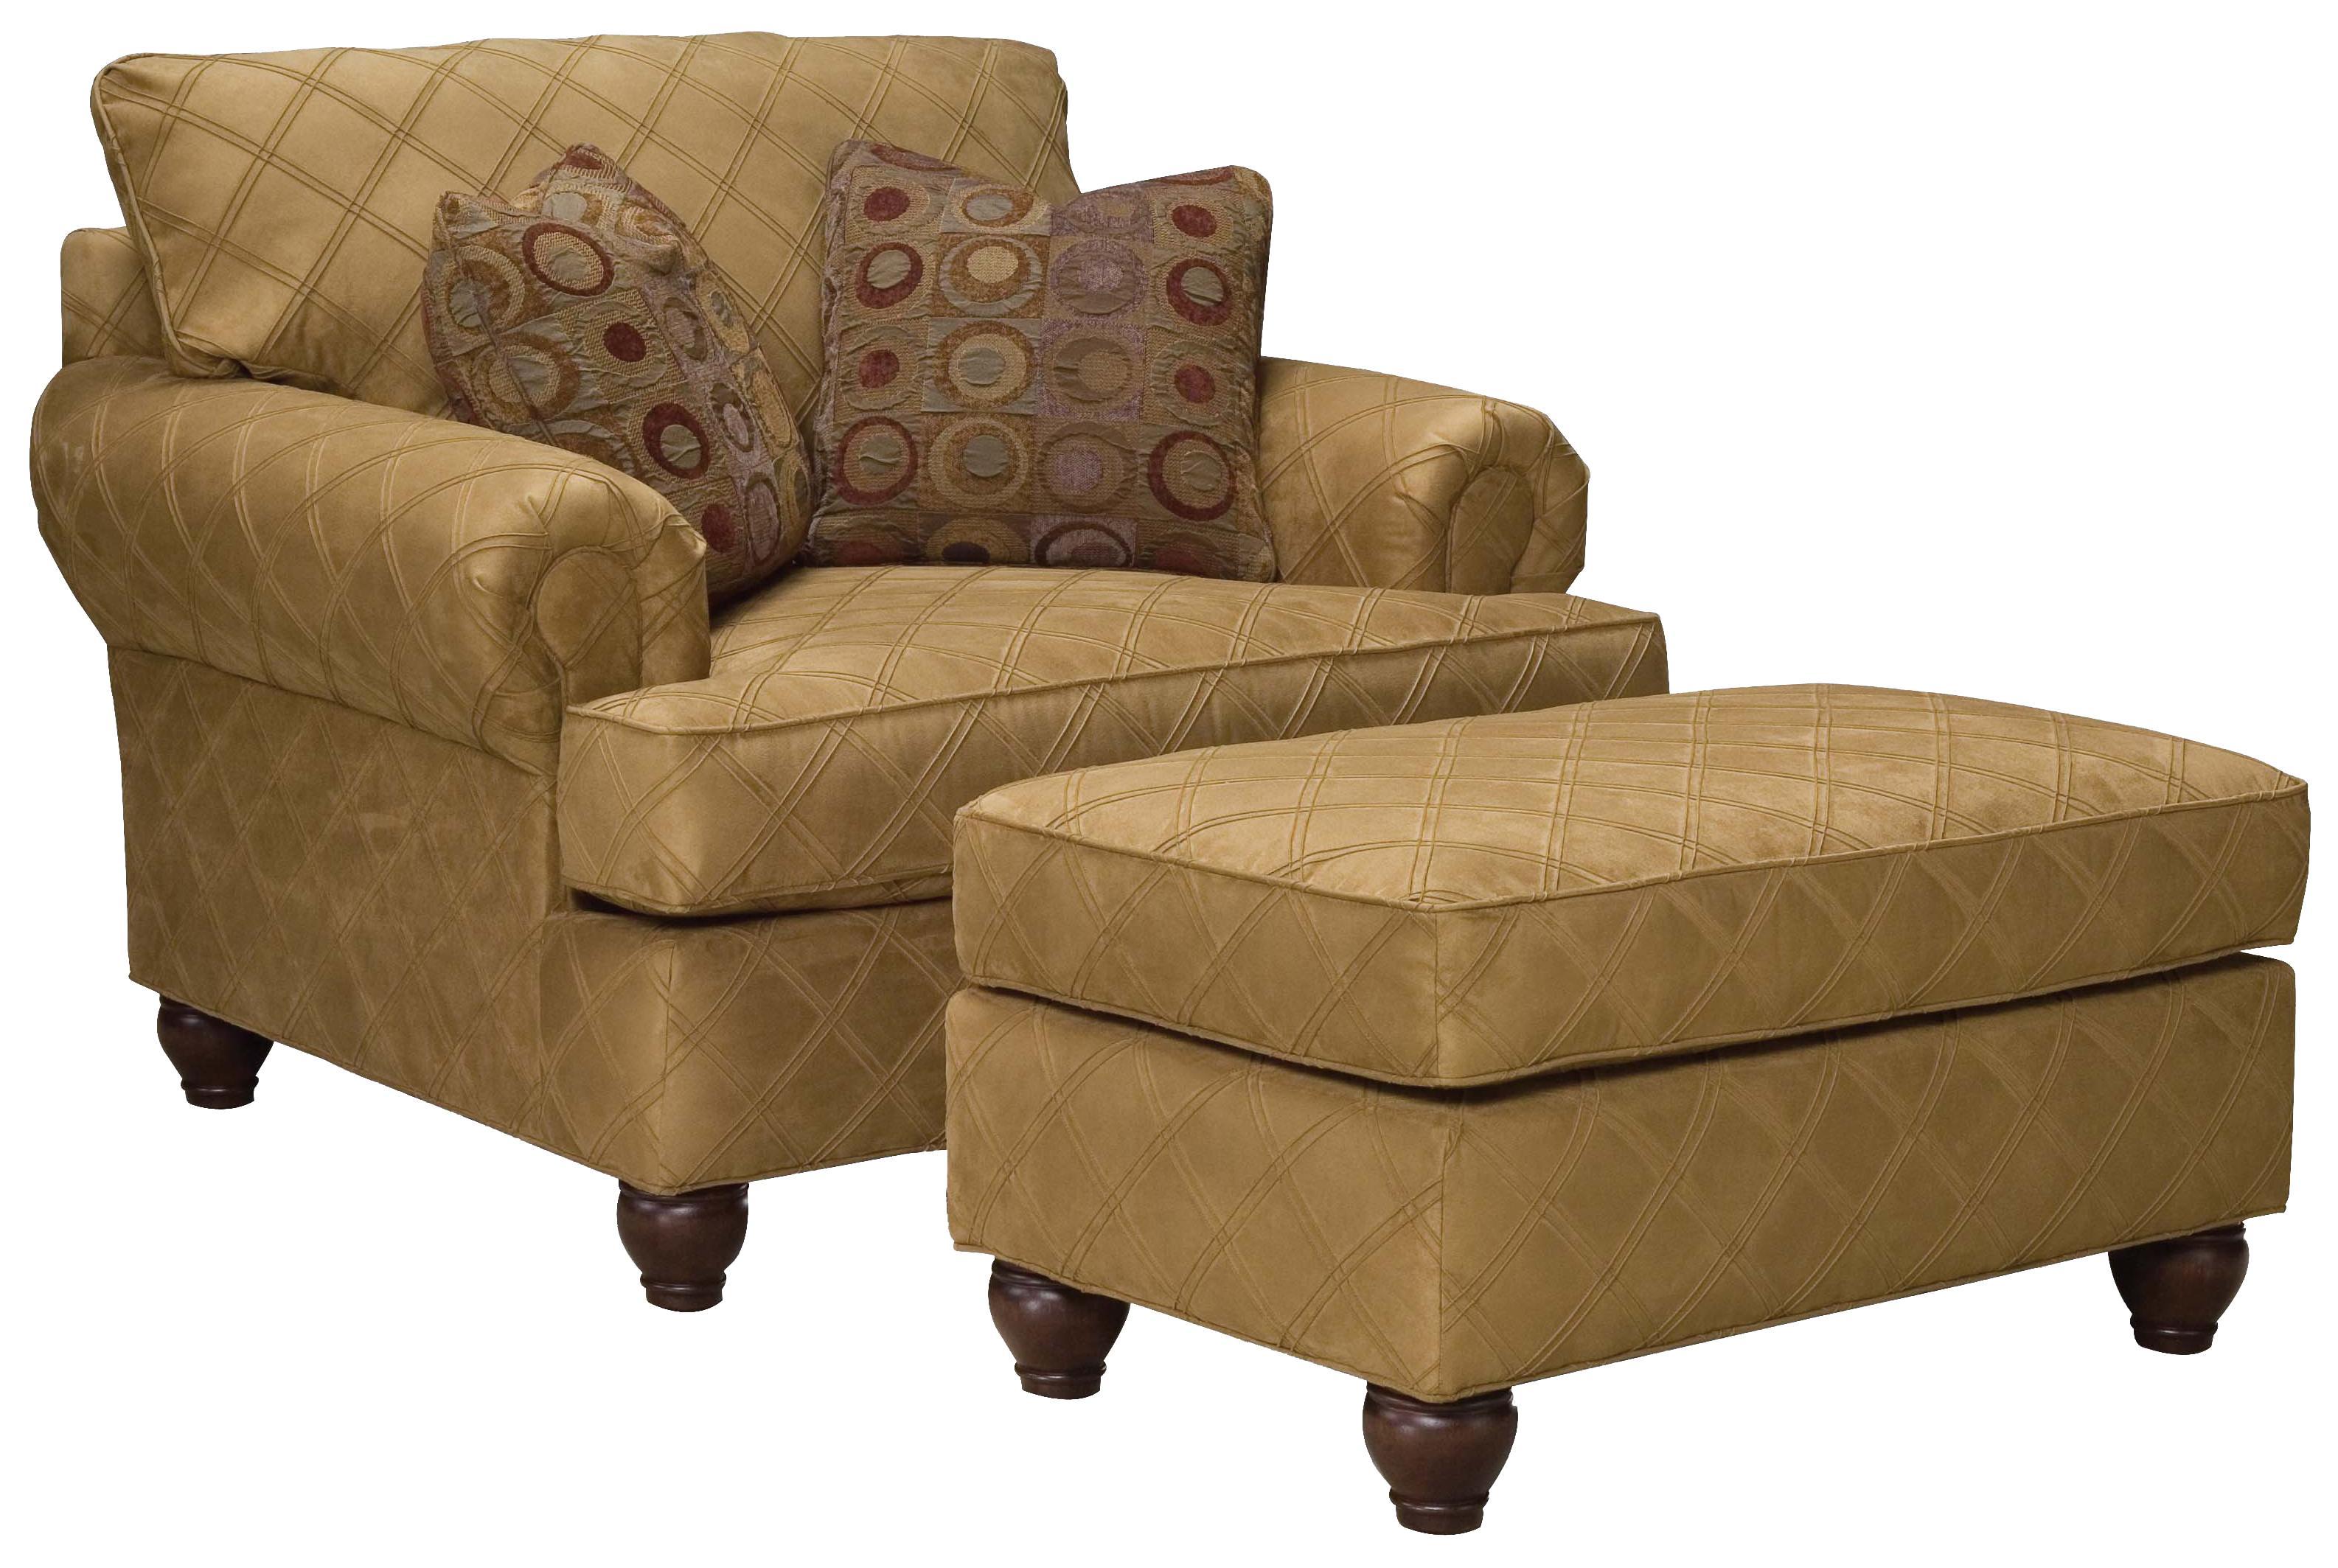 Fairfield 3738 Extra Wide Chair And Ottoman Set   Belfort Furniture   Chair  U0026 Ottoman